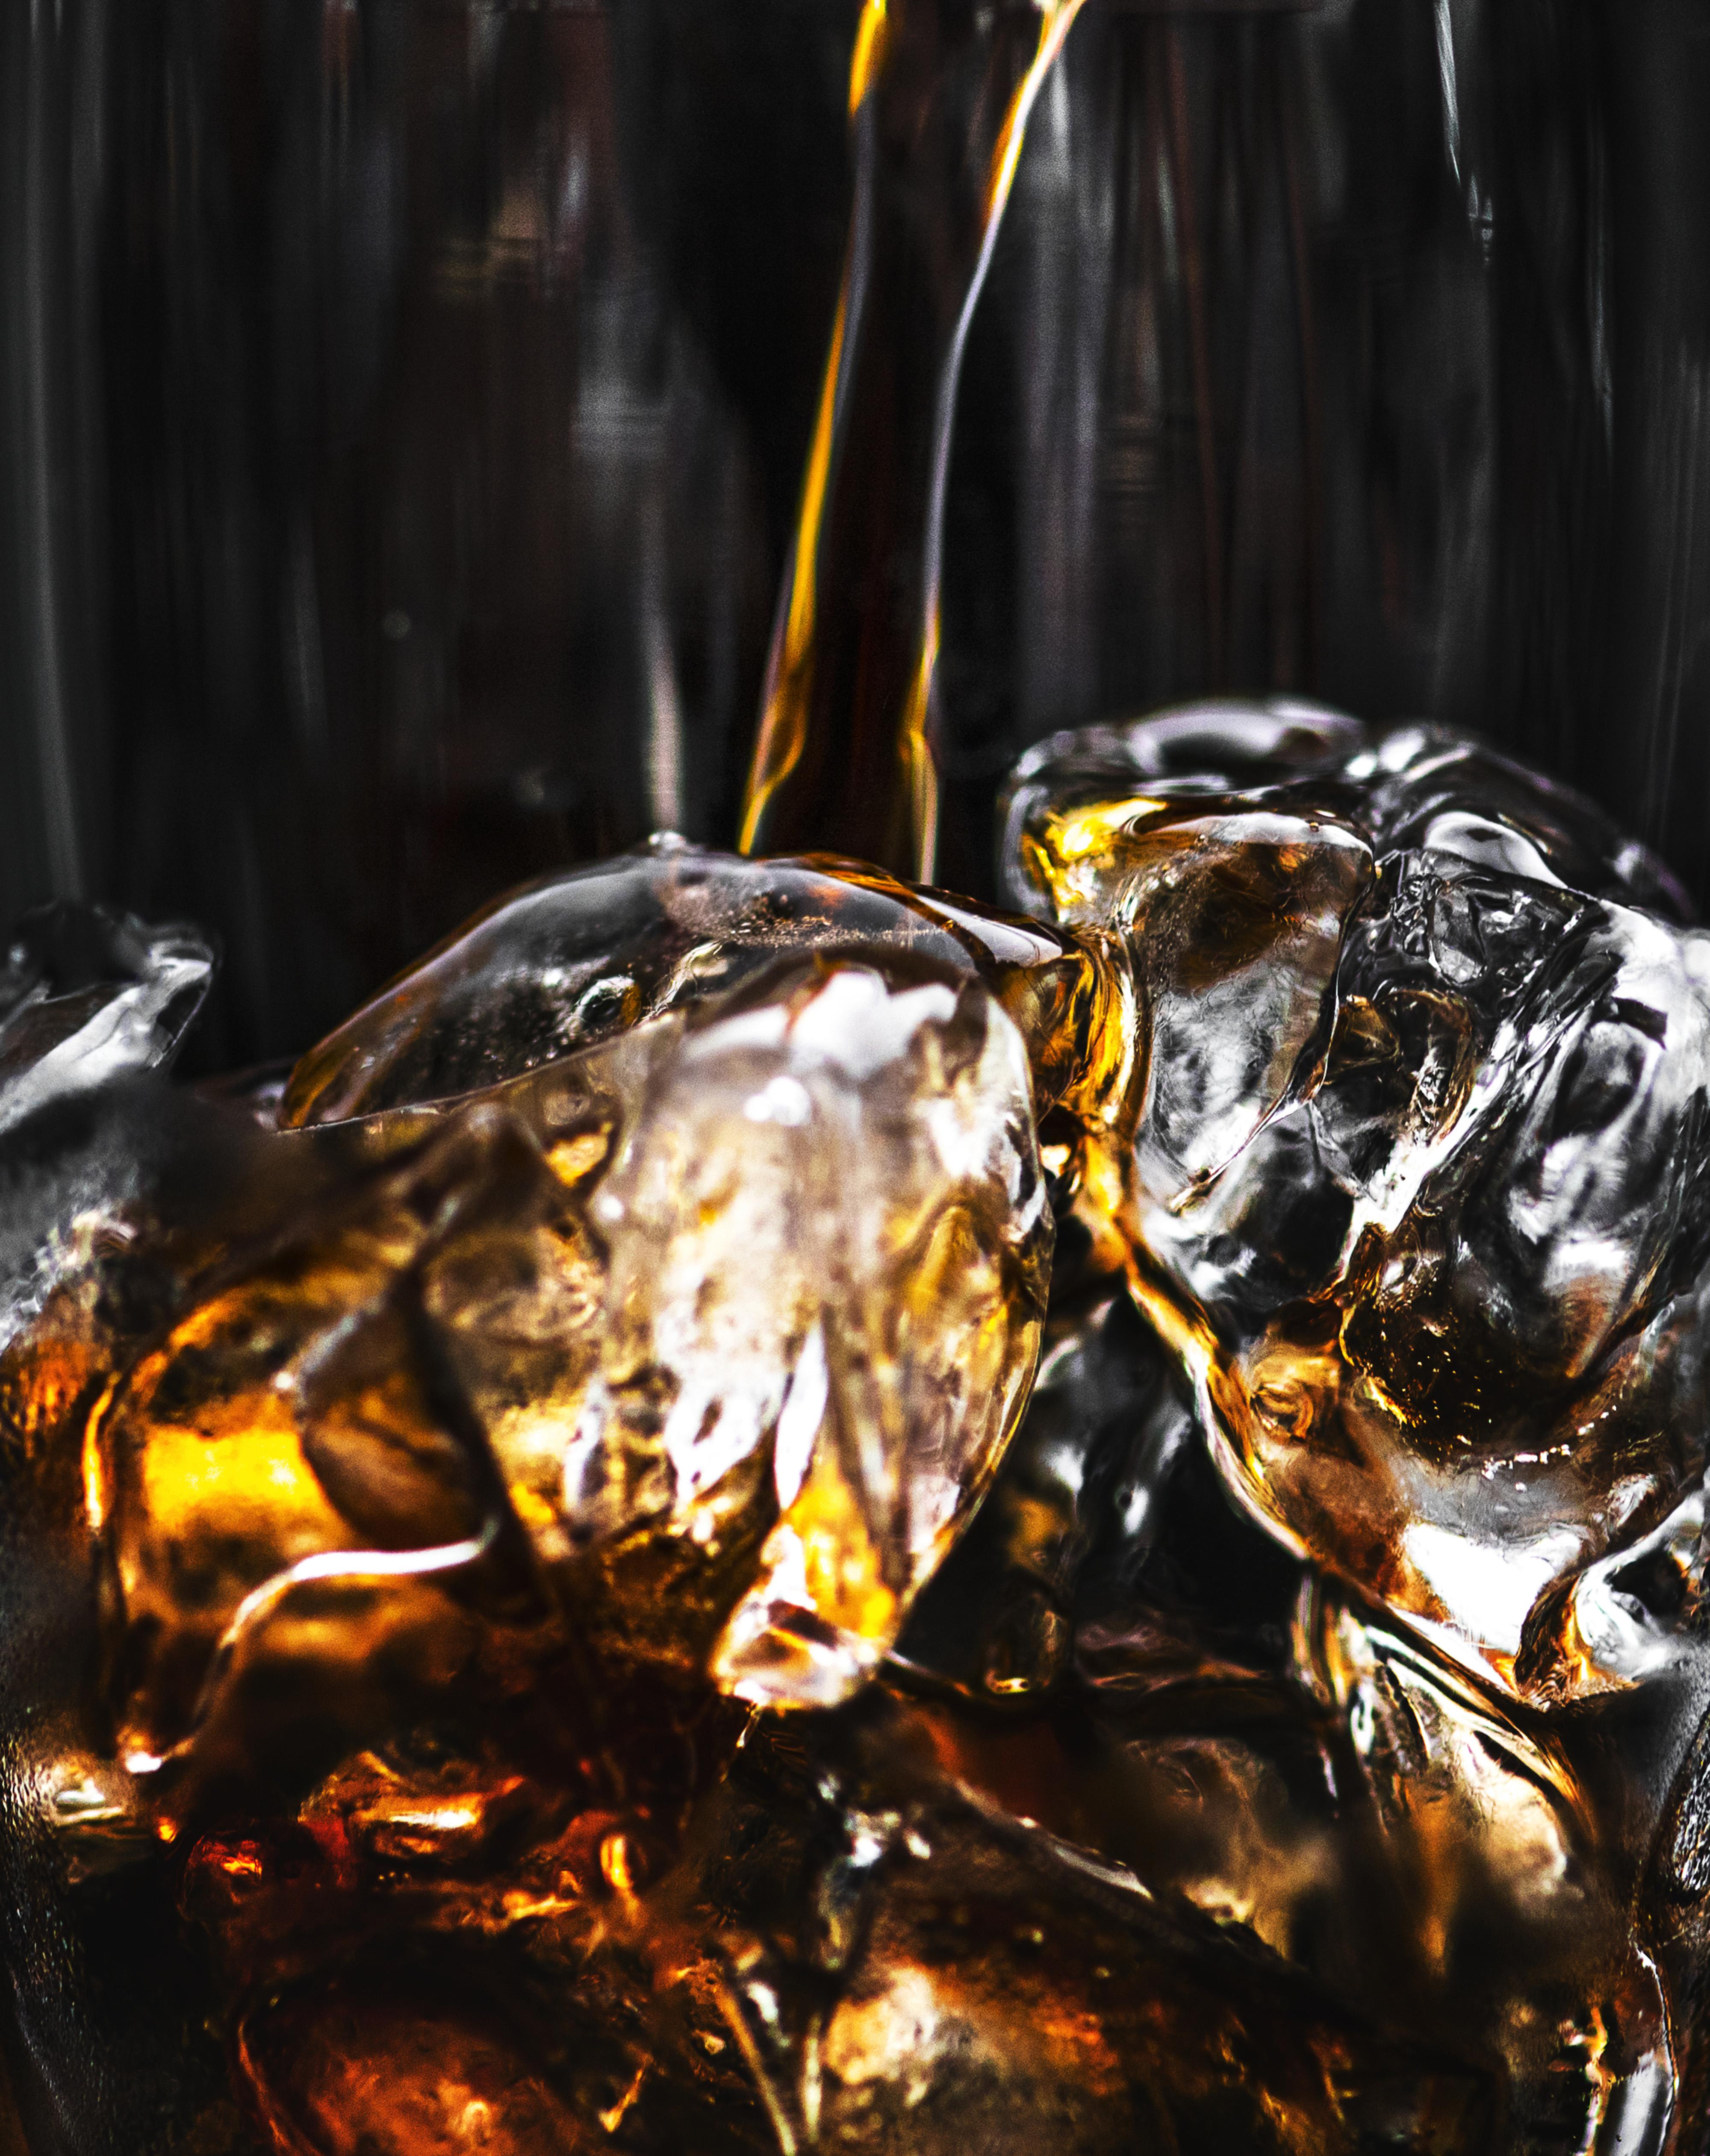 Free Images Beverage Black Background Bottle Bubble